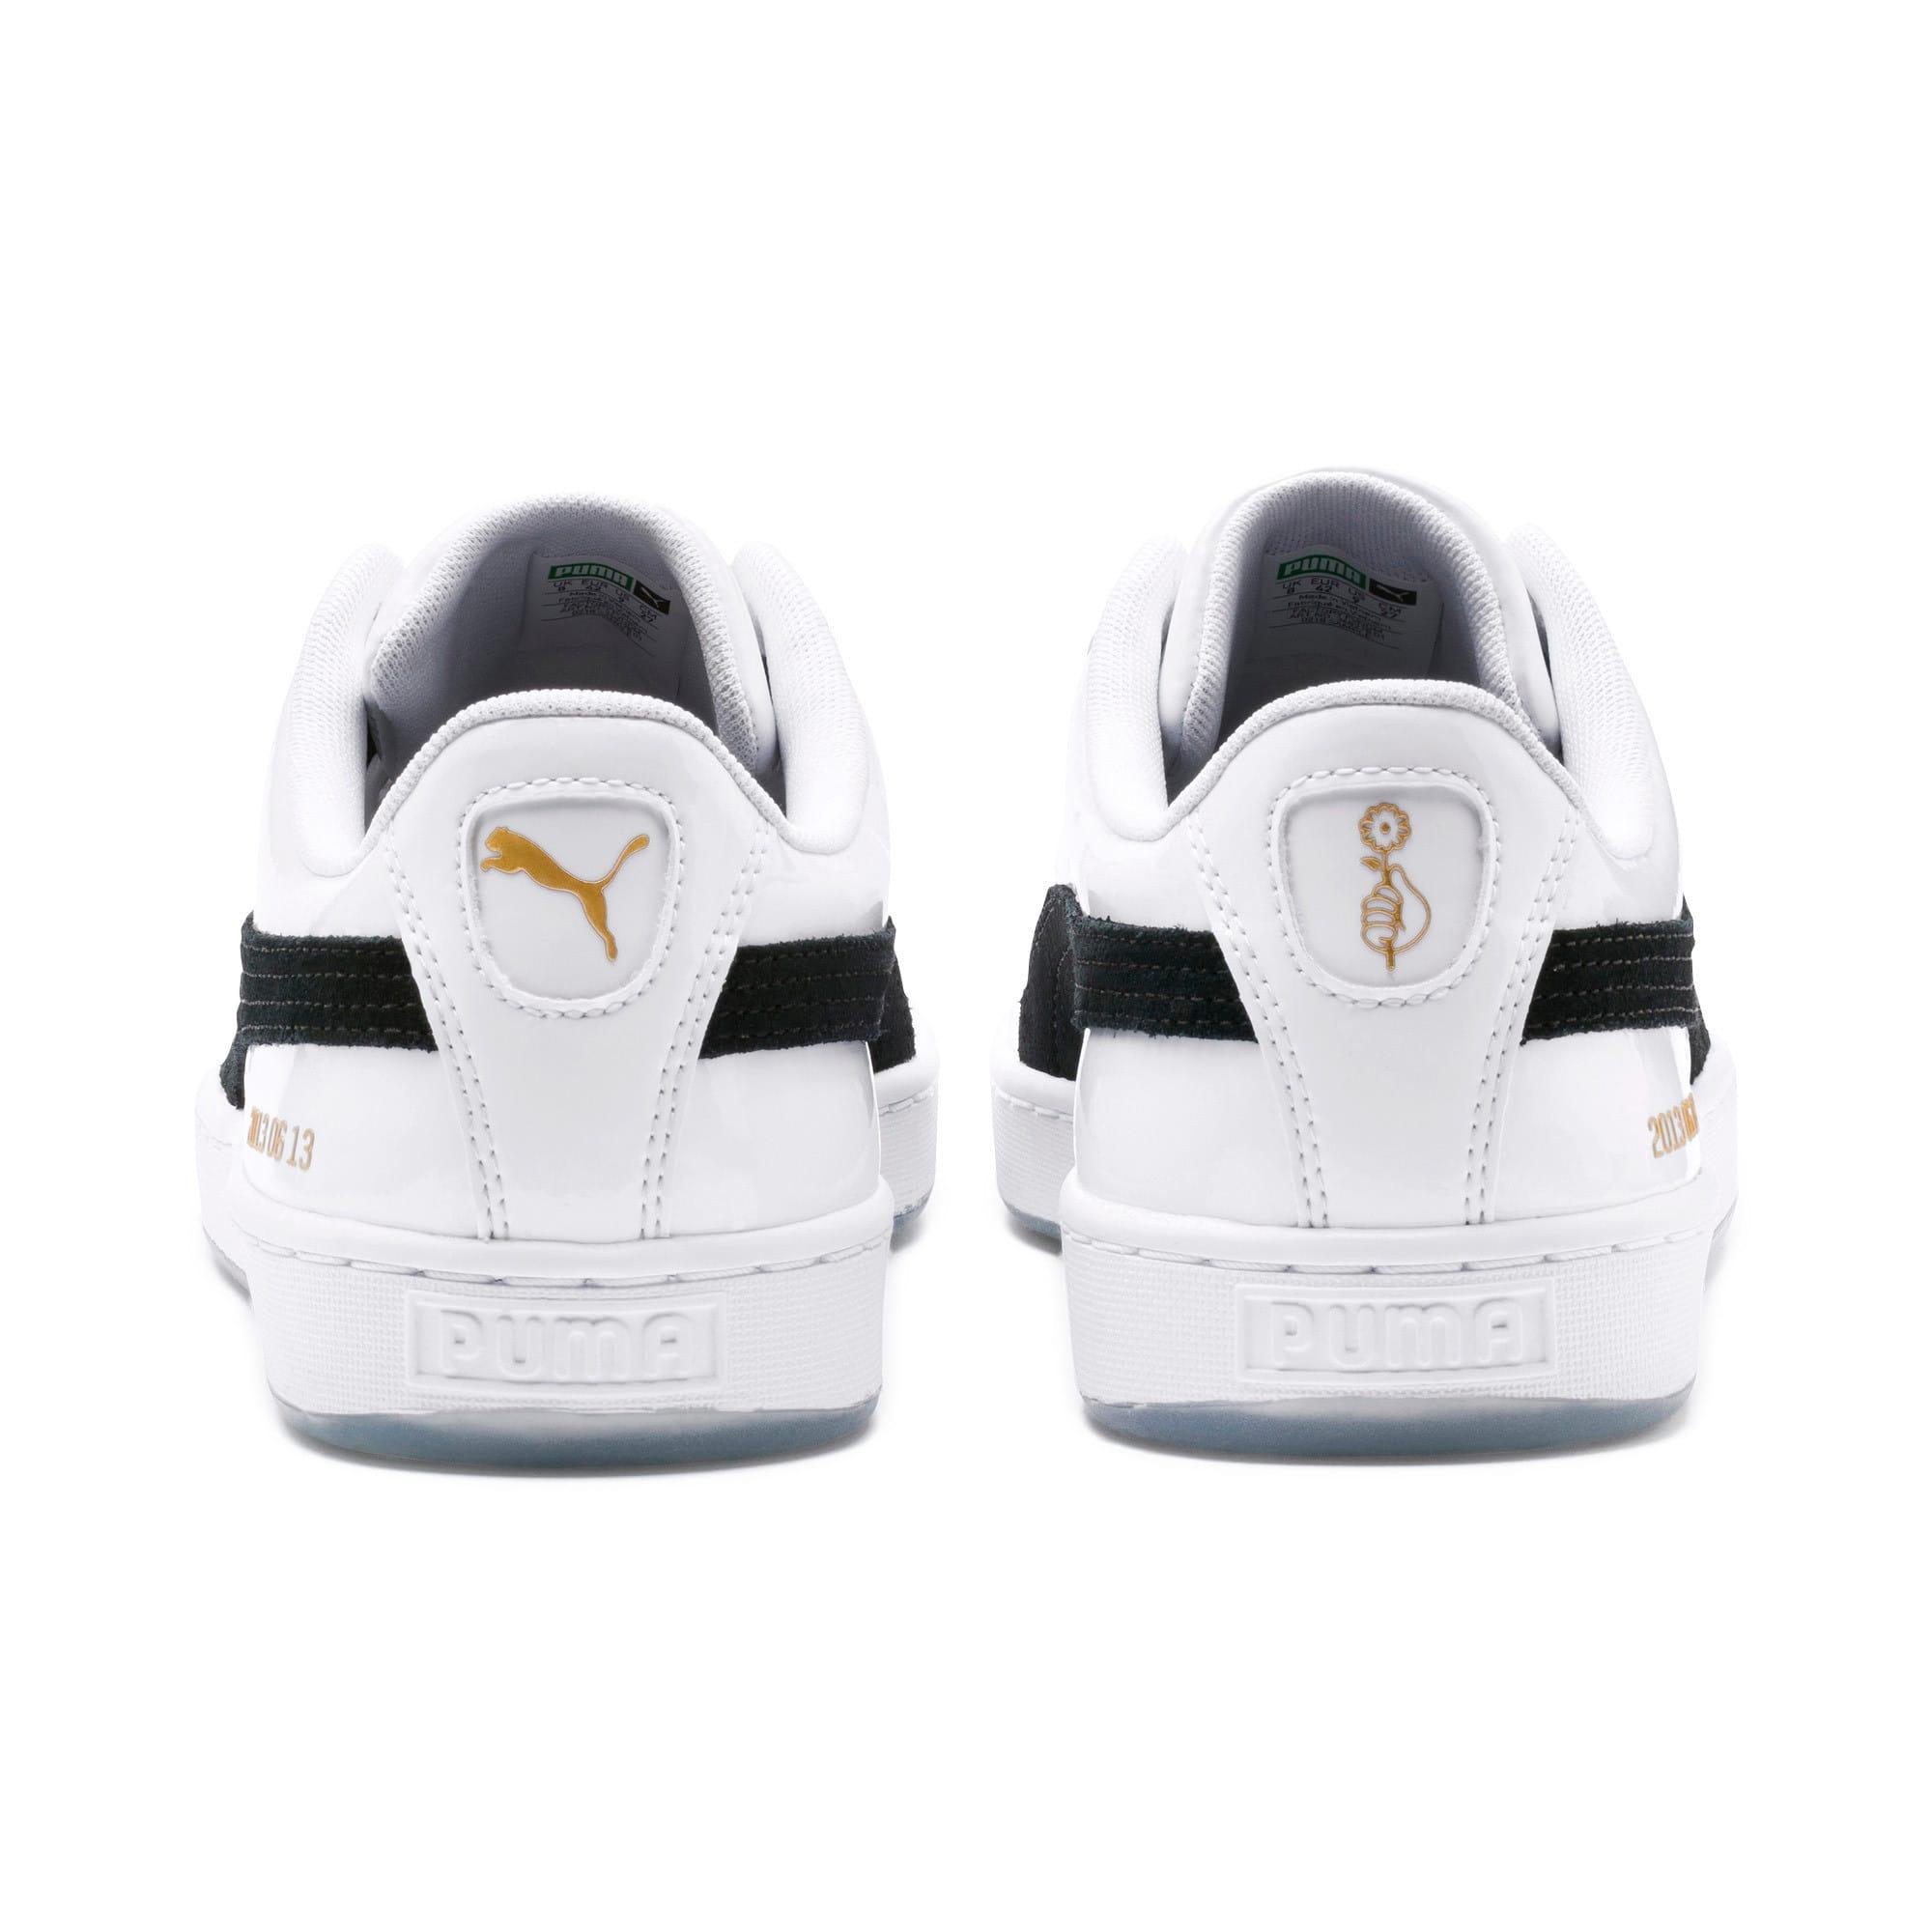 premium selection eb8db aedfb PUMA x BTS Basket Patent Sneakers